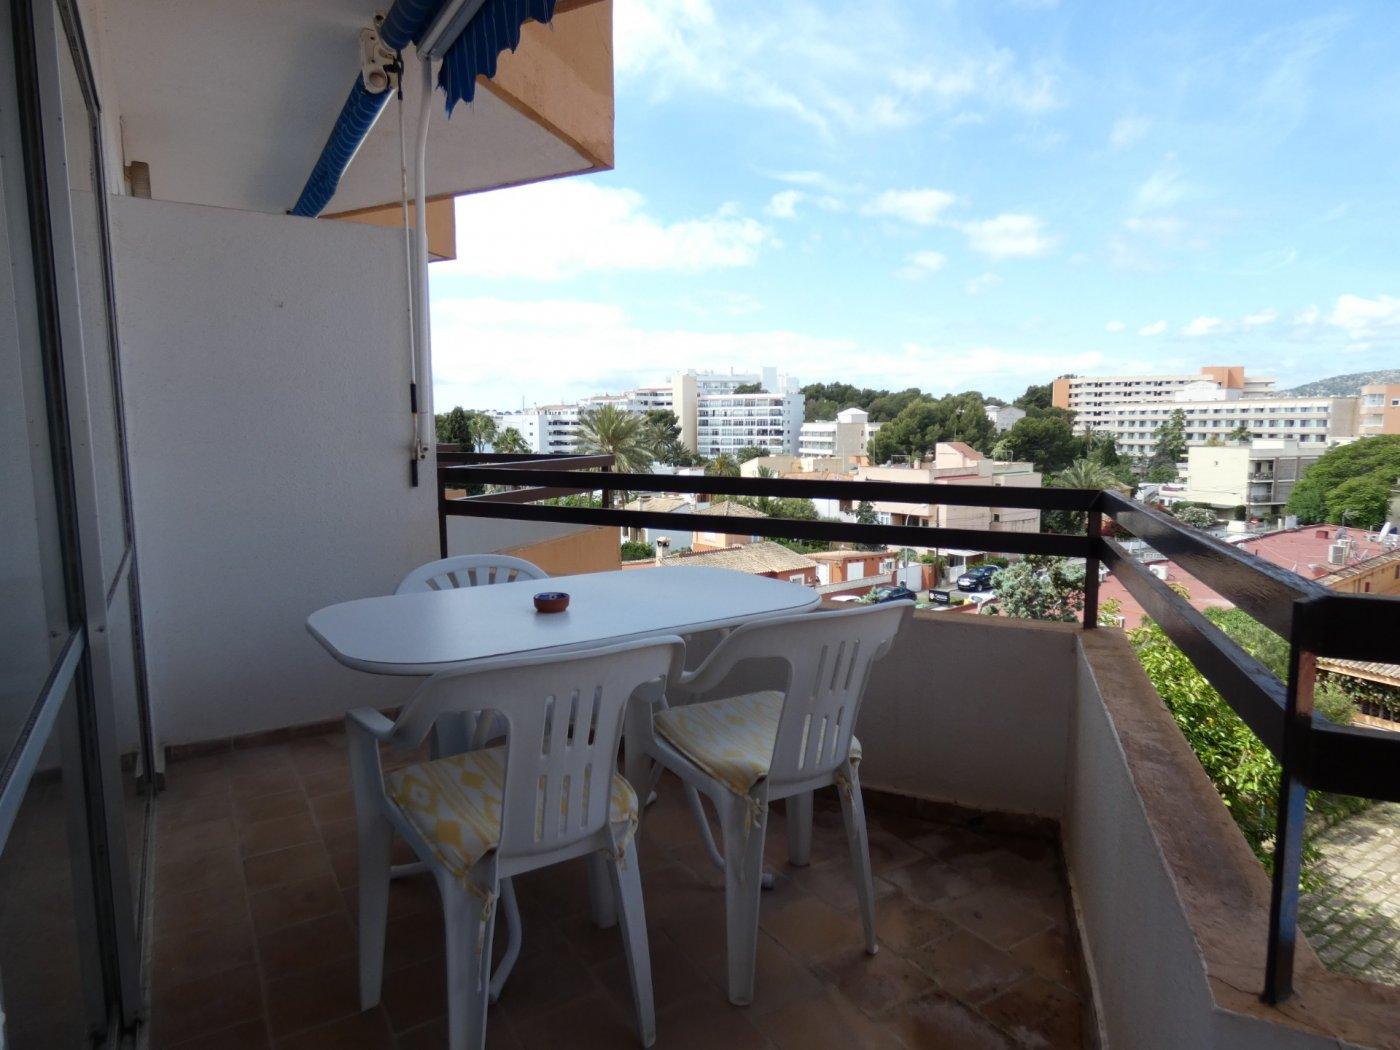 Maravilloso alquiler apartamento en son caliu!!!!! - imagenInmueble3